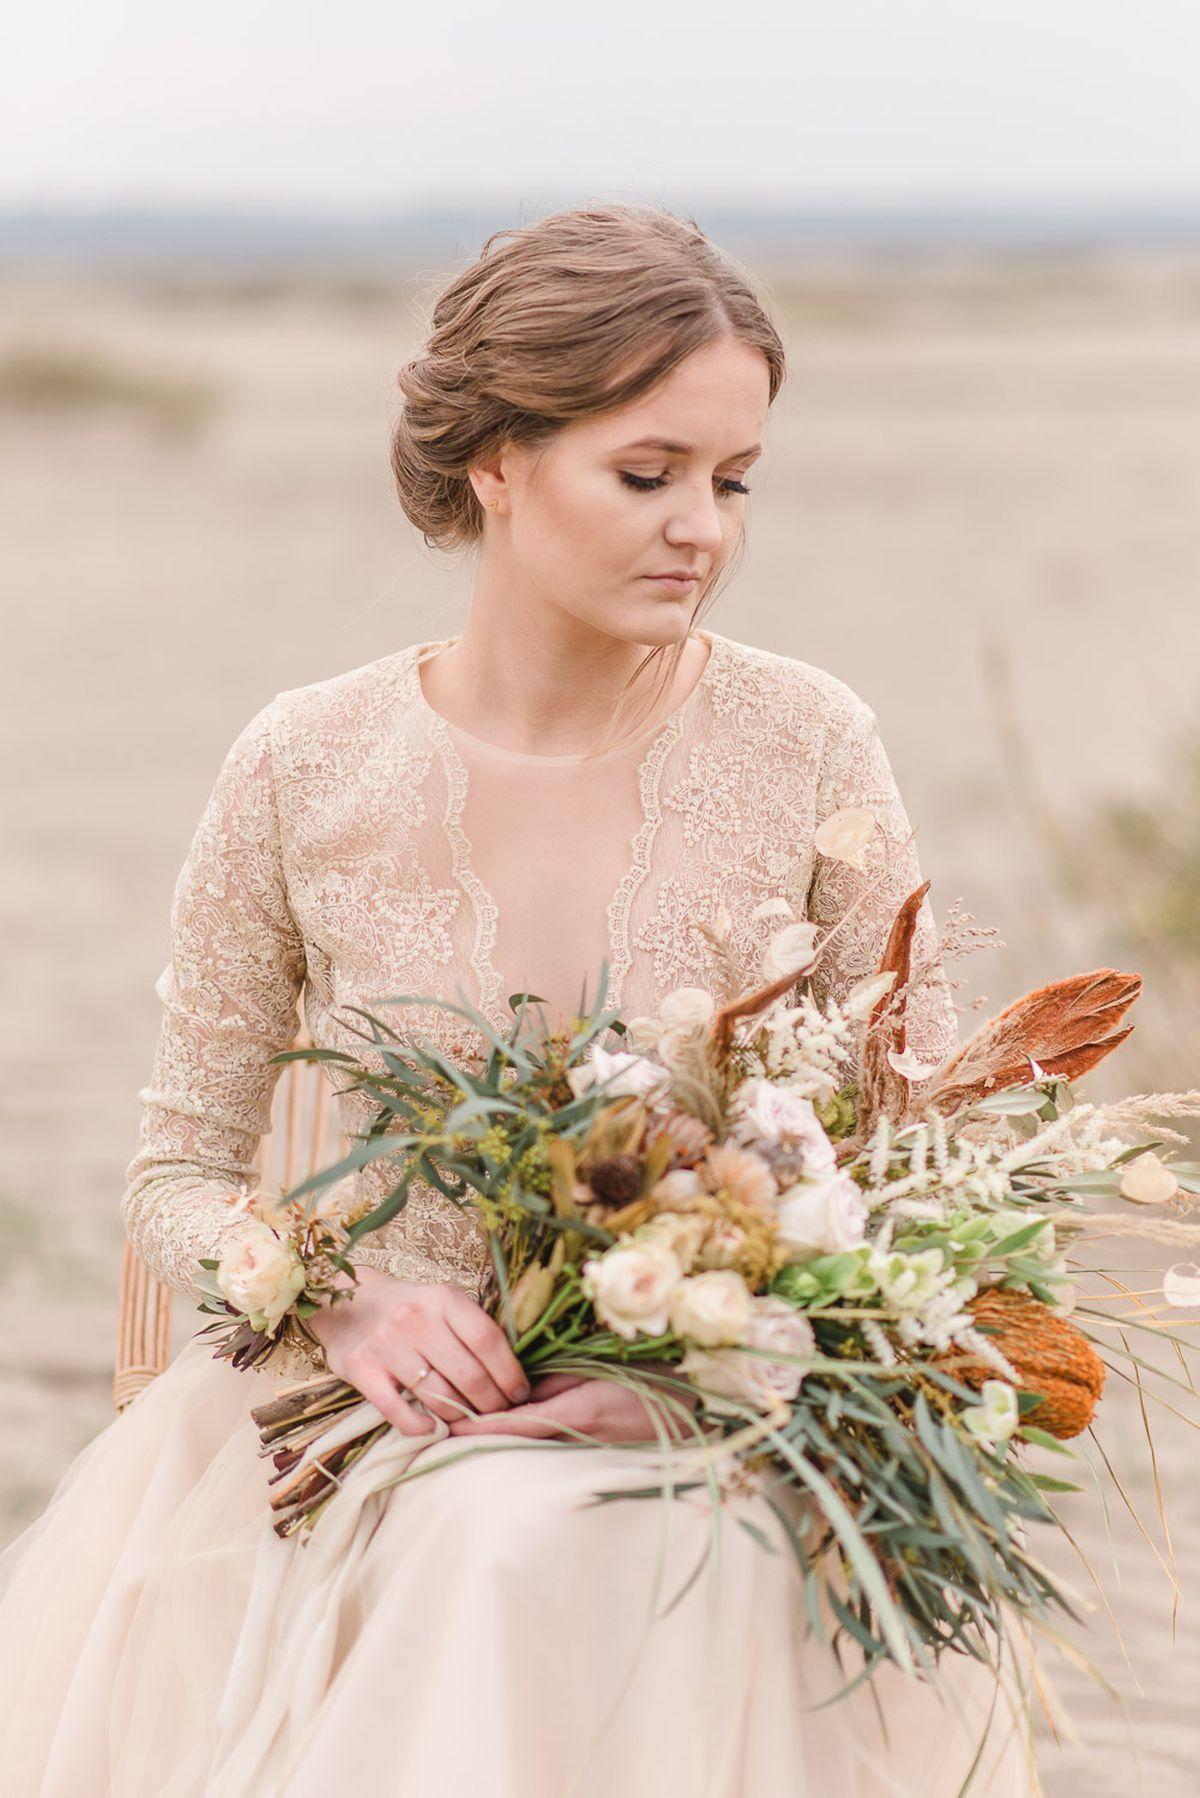 aschaaa-photography-wedding-shoot-wüste (20)